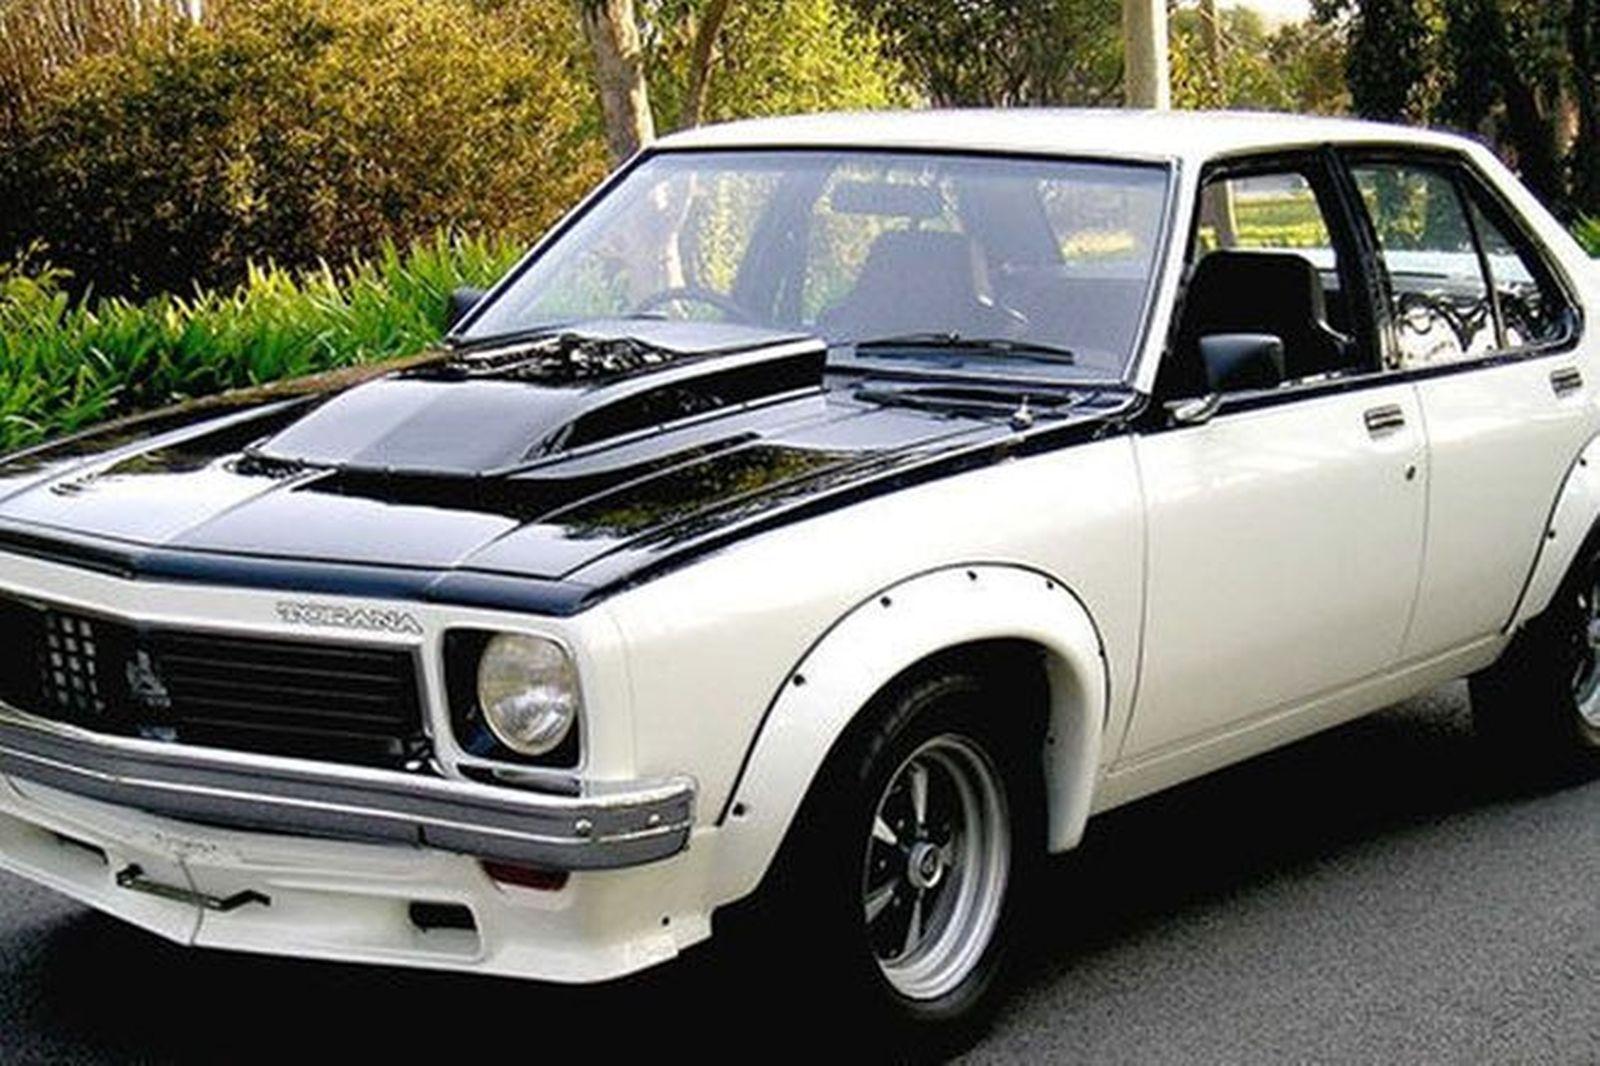 Holden Lx Torana A9x Sedan Auctions Lot 26 Shannons